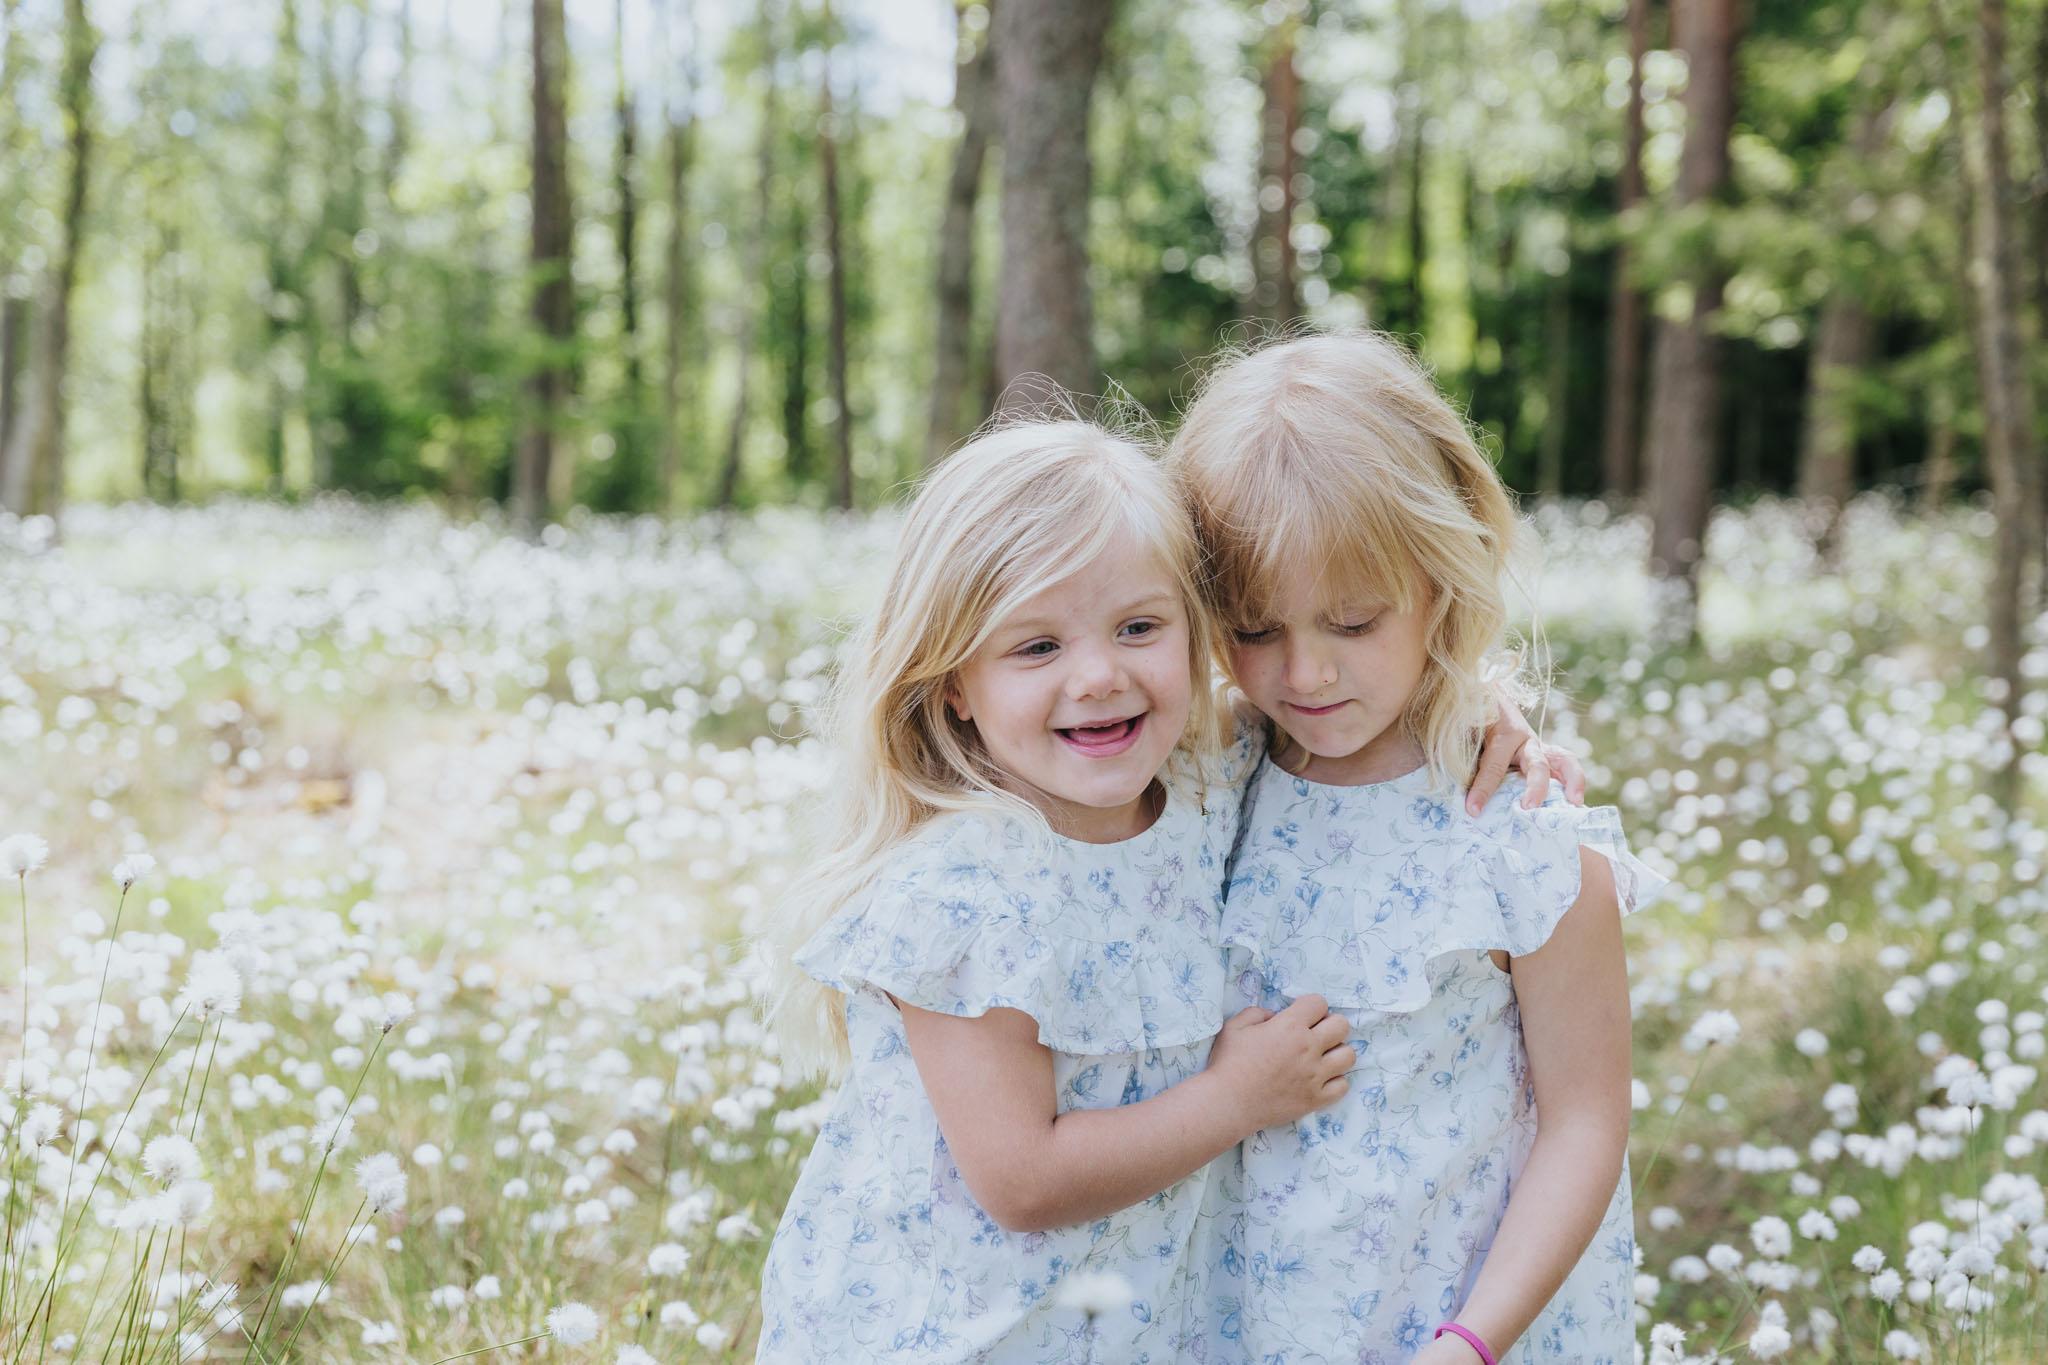 2018 05 20  Familjefotografering Almarsson, Fotograf Emy, 41.jpg